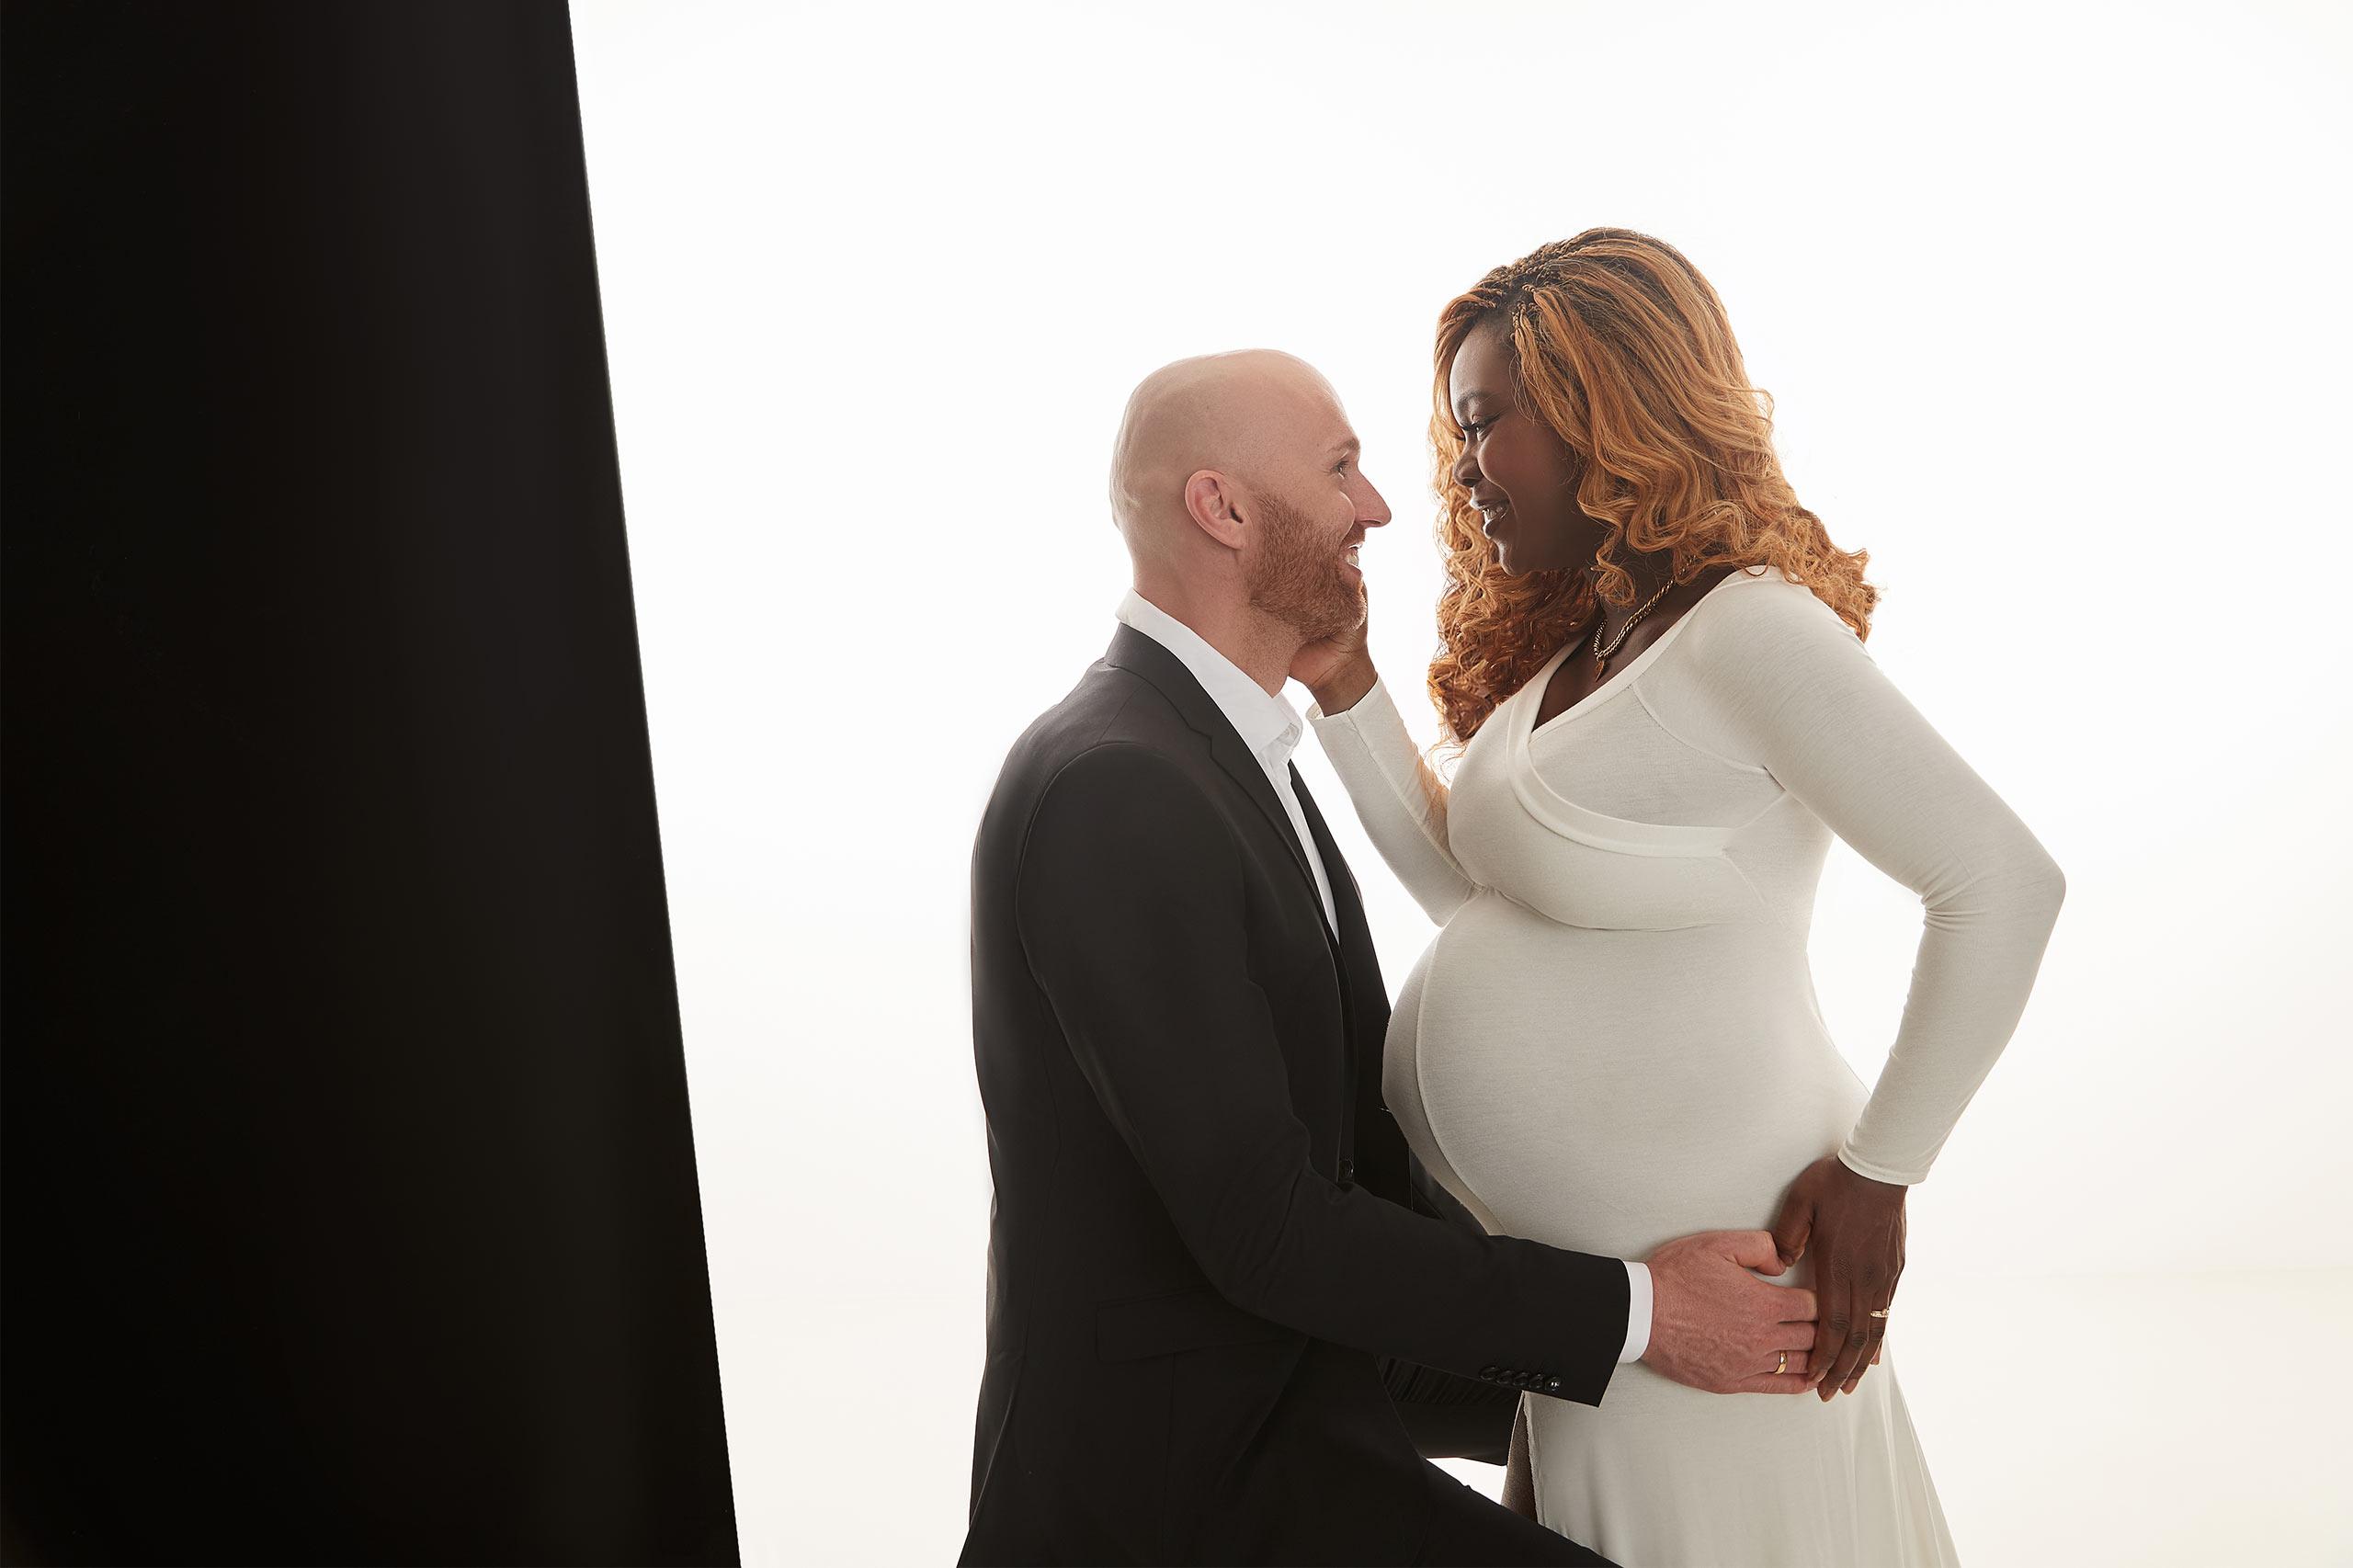 Schwangere Frau mit Mann Fotoshooting